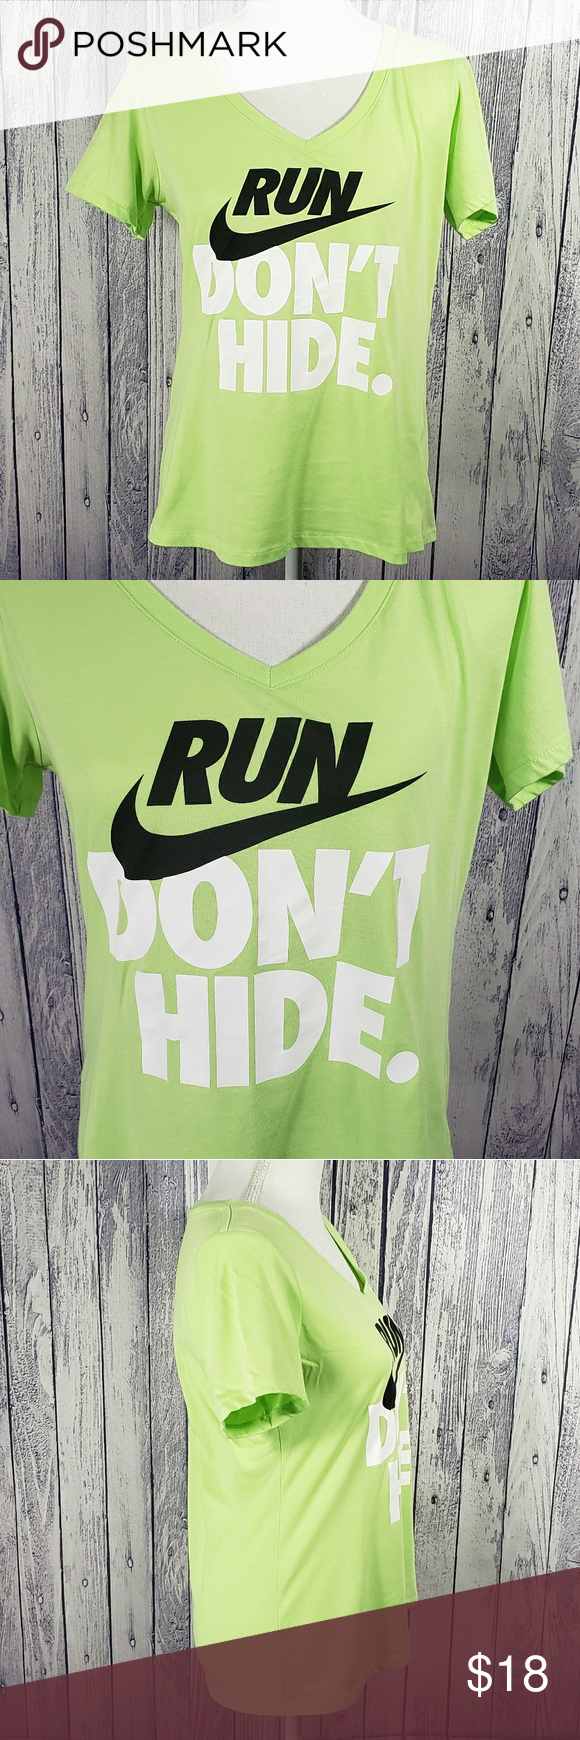 5b268815bd0 Nike Run Don't Hide Graphic Tee s7-3 Nike Dri-Fit short sleeve v ...